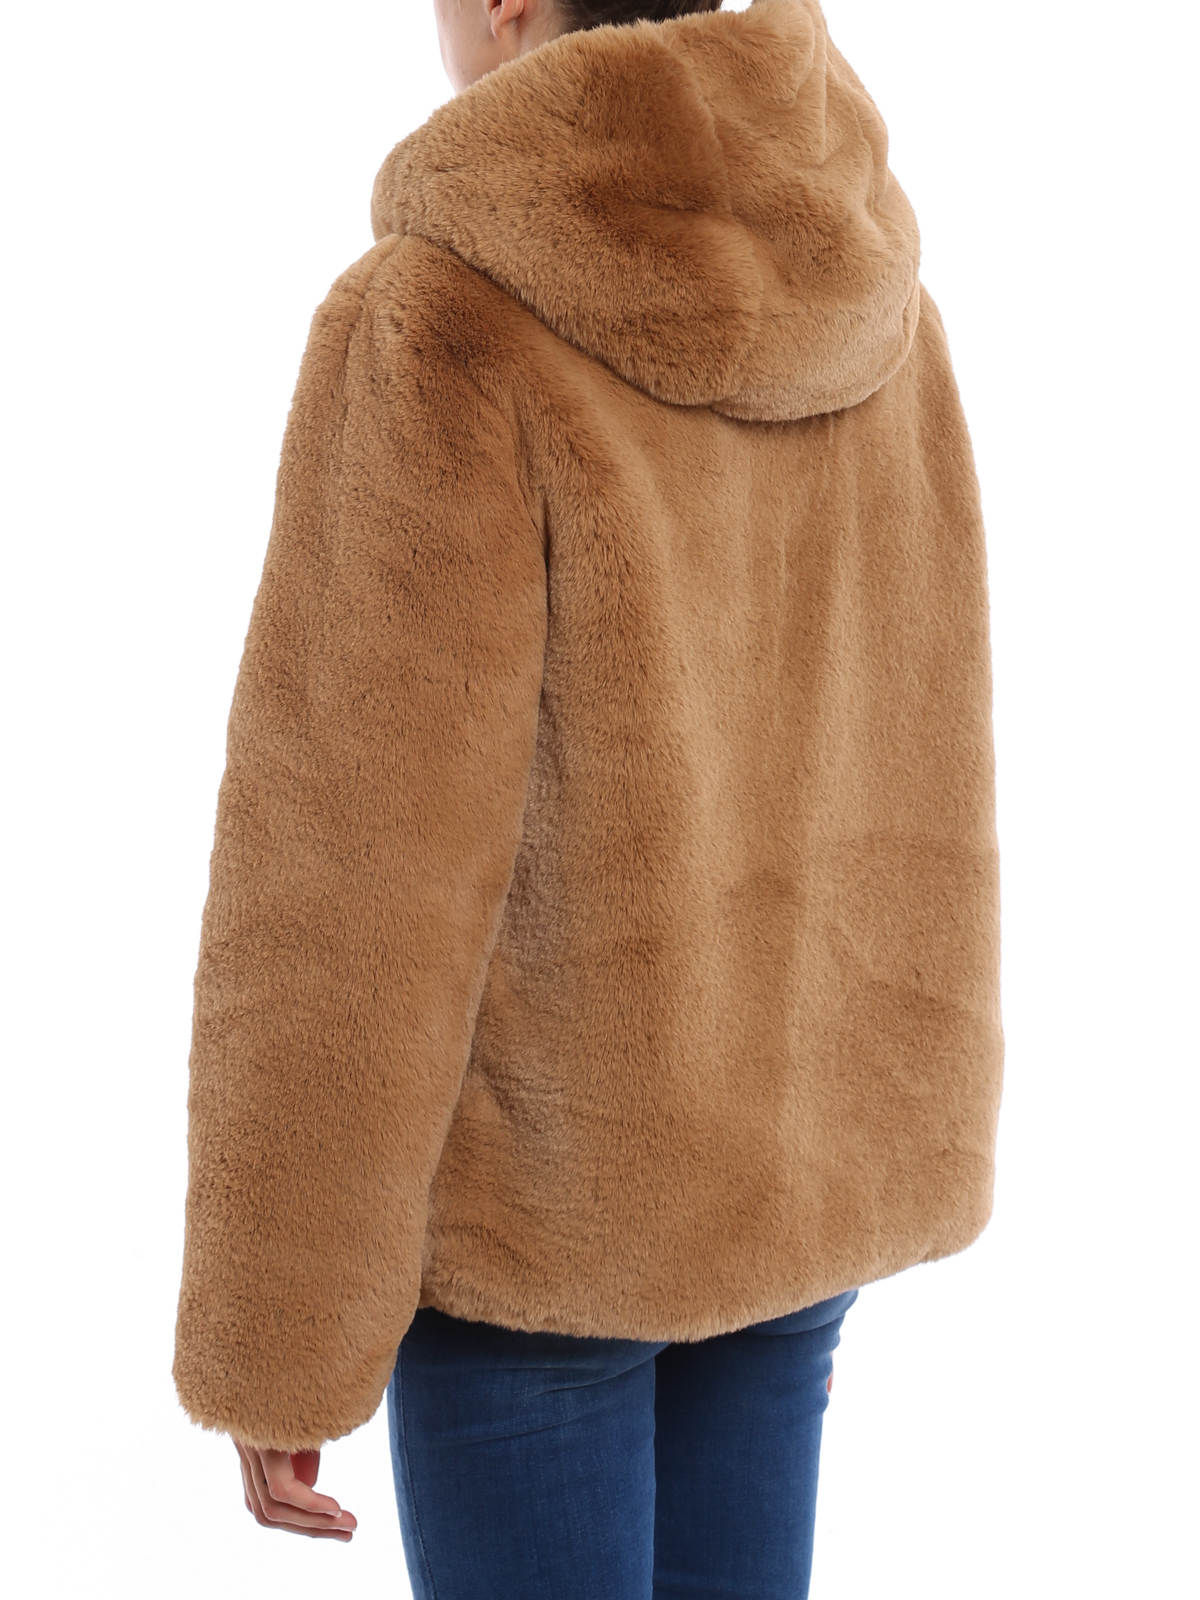 Discount Official Site COATS & JACKETS - Faux furs Dondup 100% Original For Sale Amazing Price For Sale 26jxv4htG